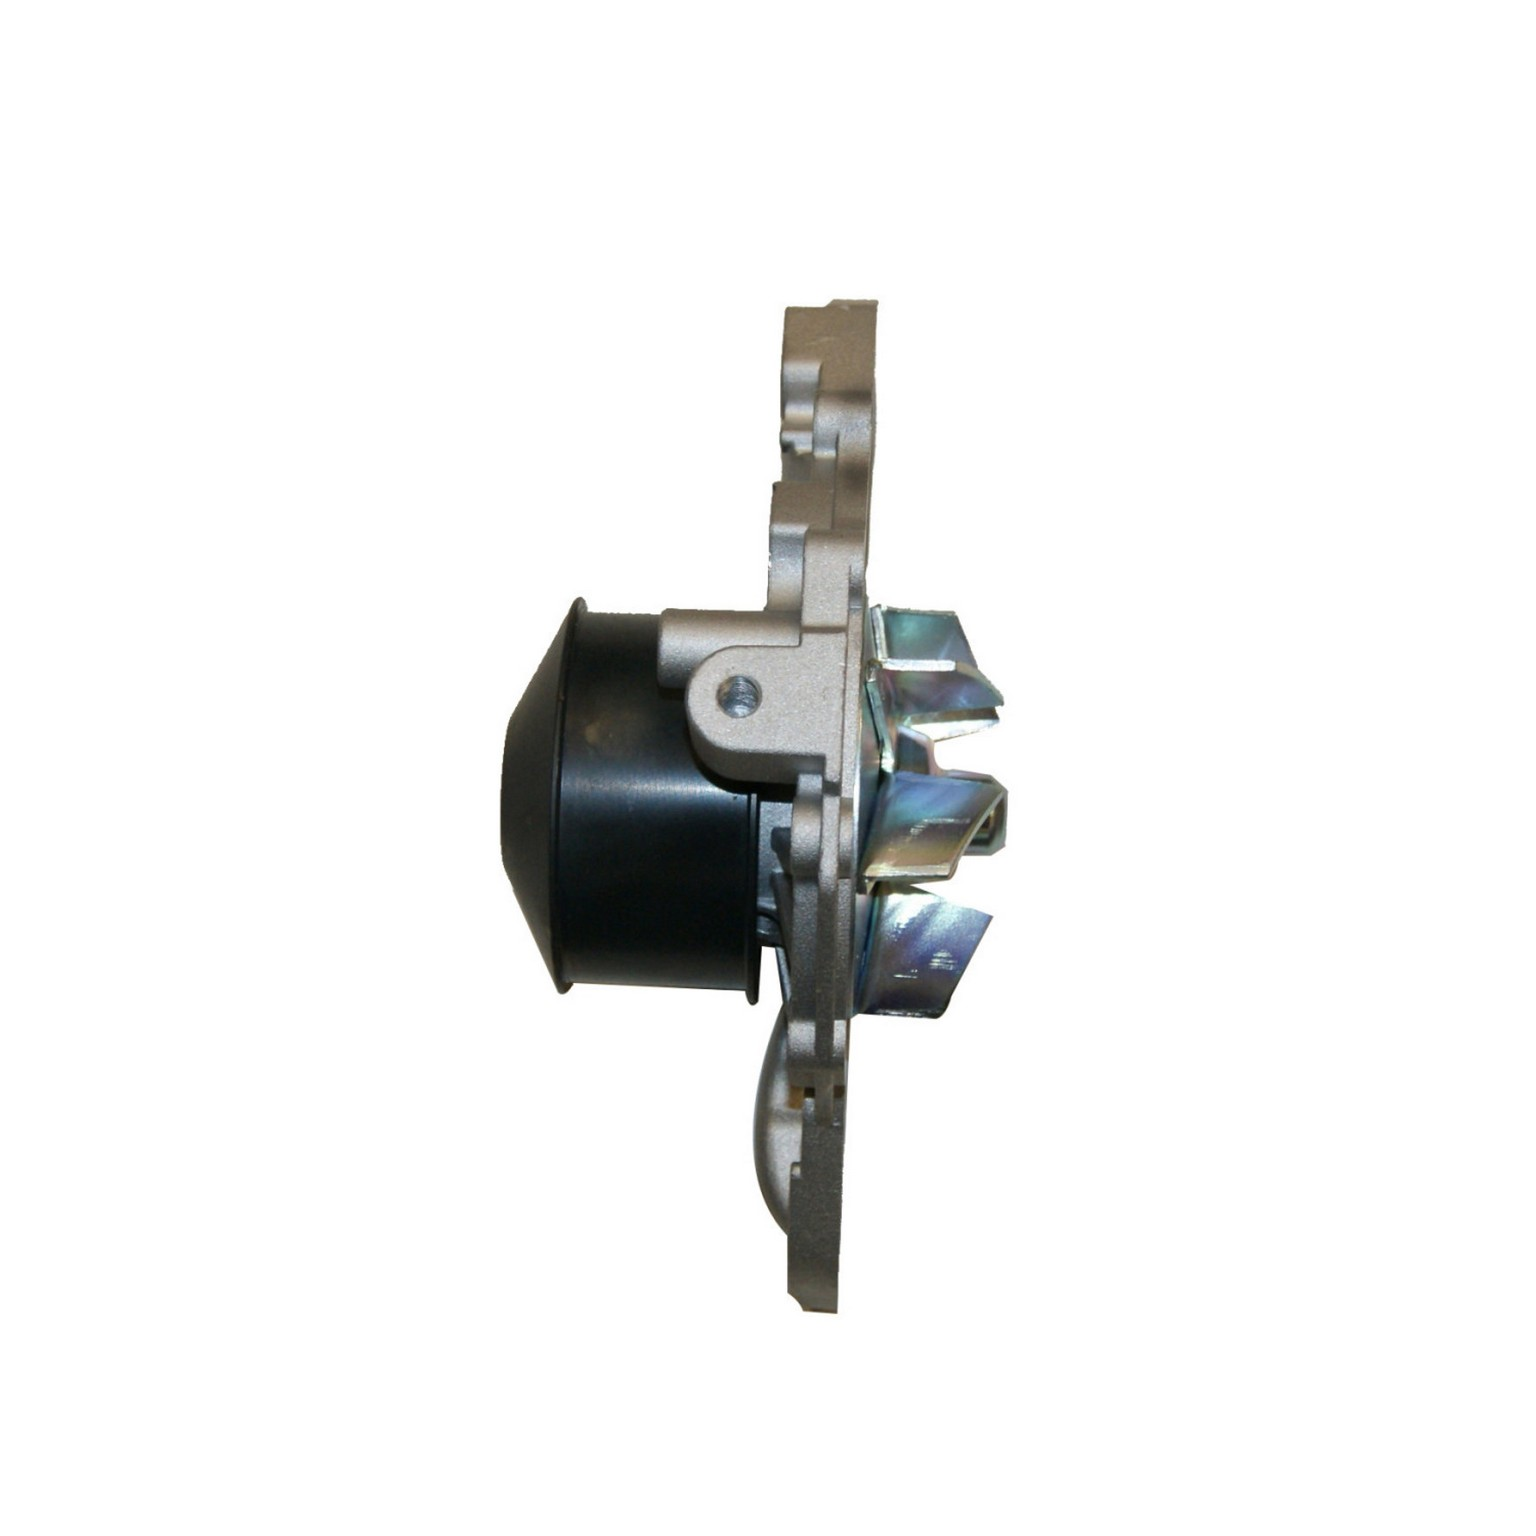 2003 Kia Sedona Engine Water Pump Coolant Reservoir G6 146 1134